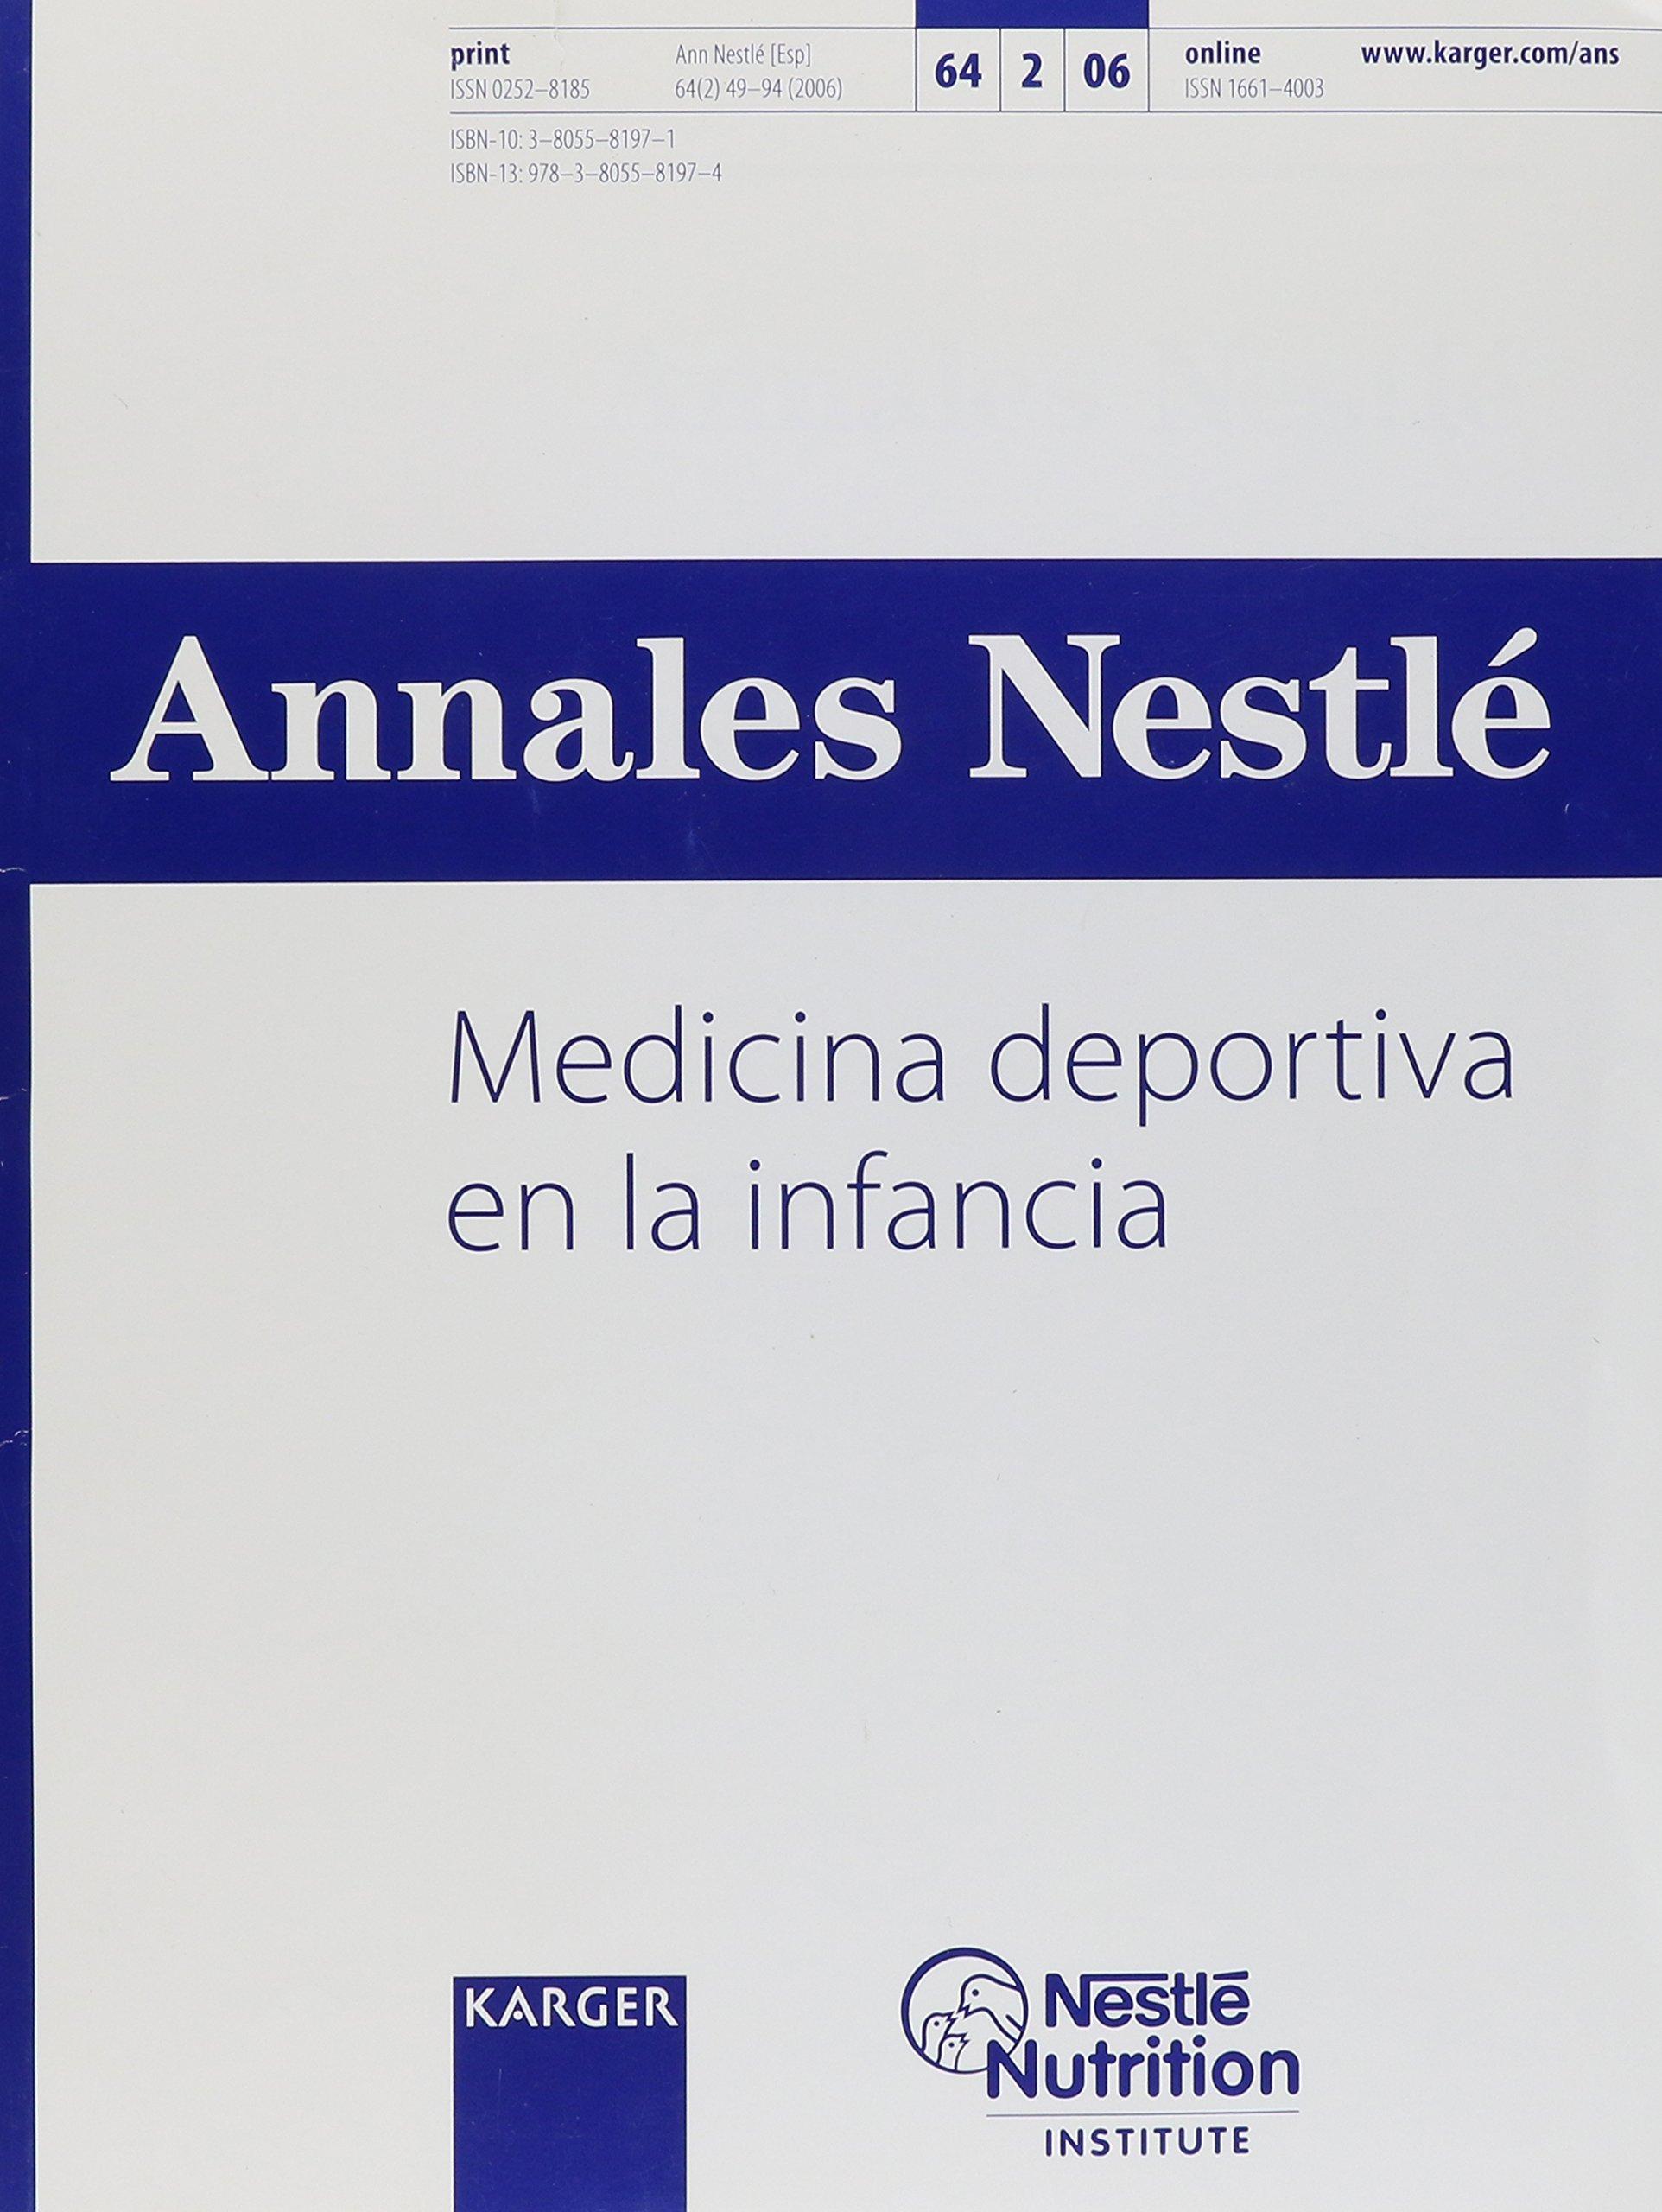 Download Medicina deportiva en la infancia: Special Issue, Annales Nestle 2006 (Spanish Edition) pdf epub